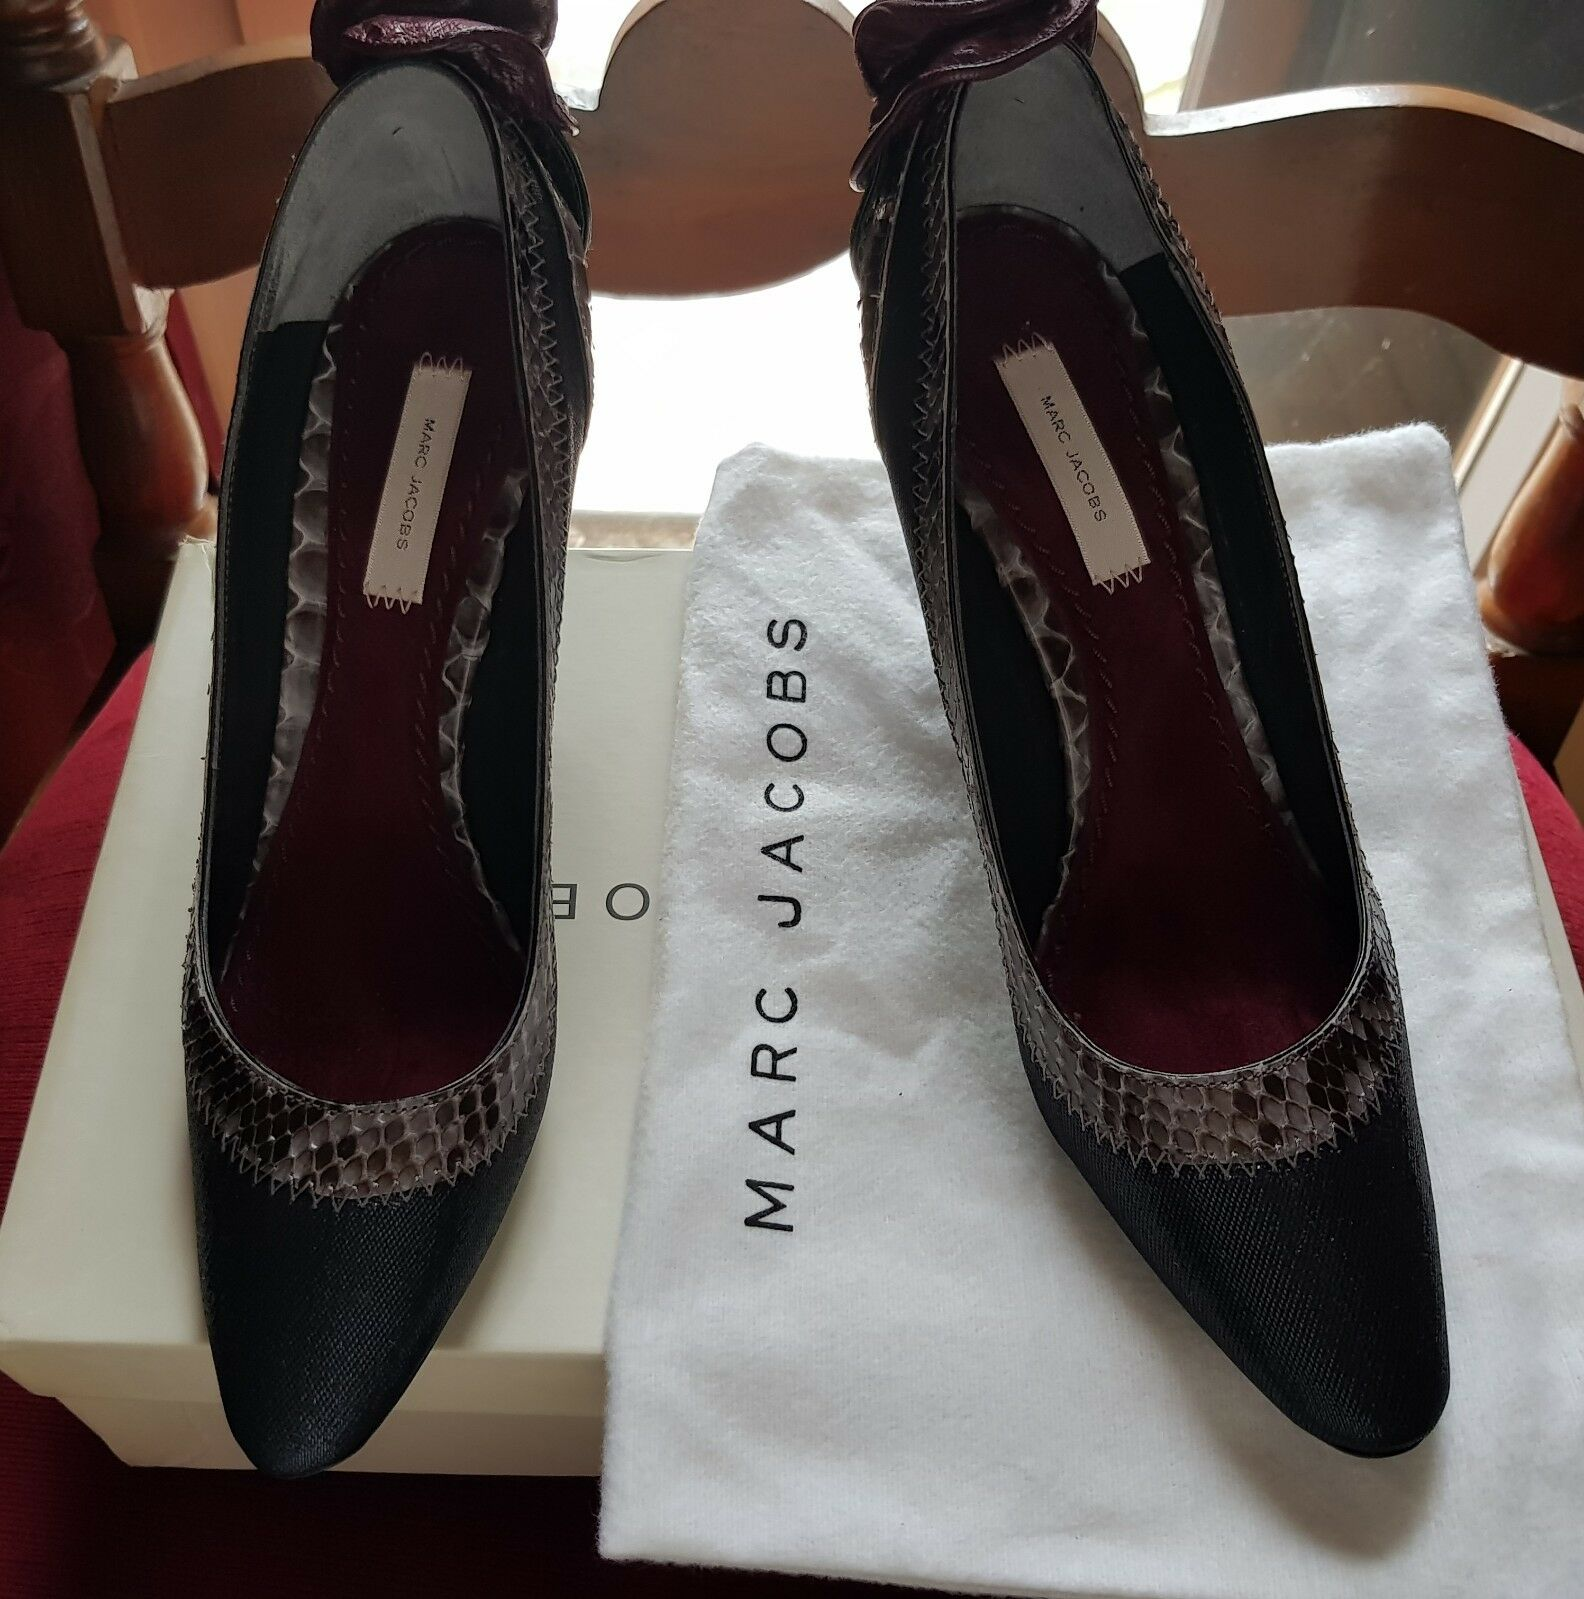 MARC metalizzato JACOBS Schuhe Decollete' pitone metalizzato MARC Schuhes rose pythone Luxus Schoe 8dc611